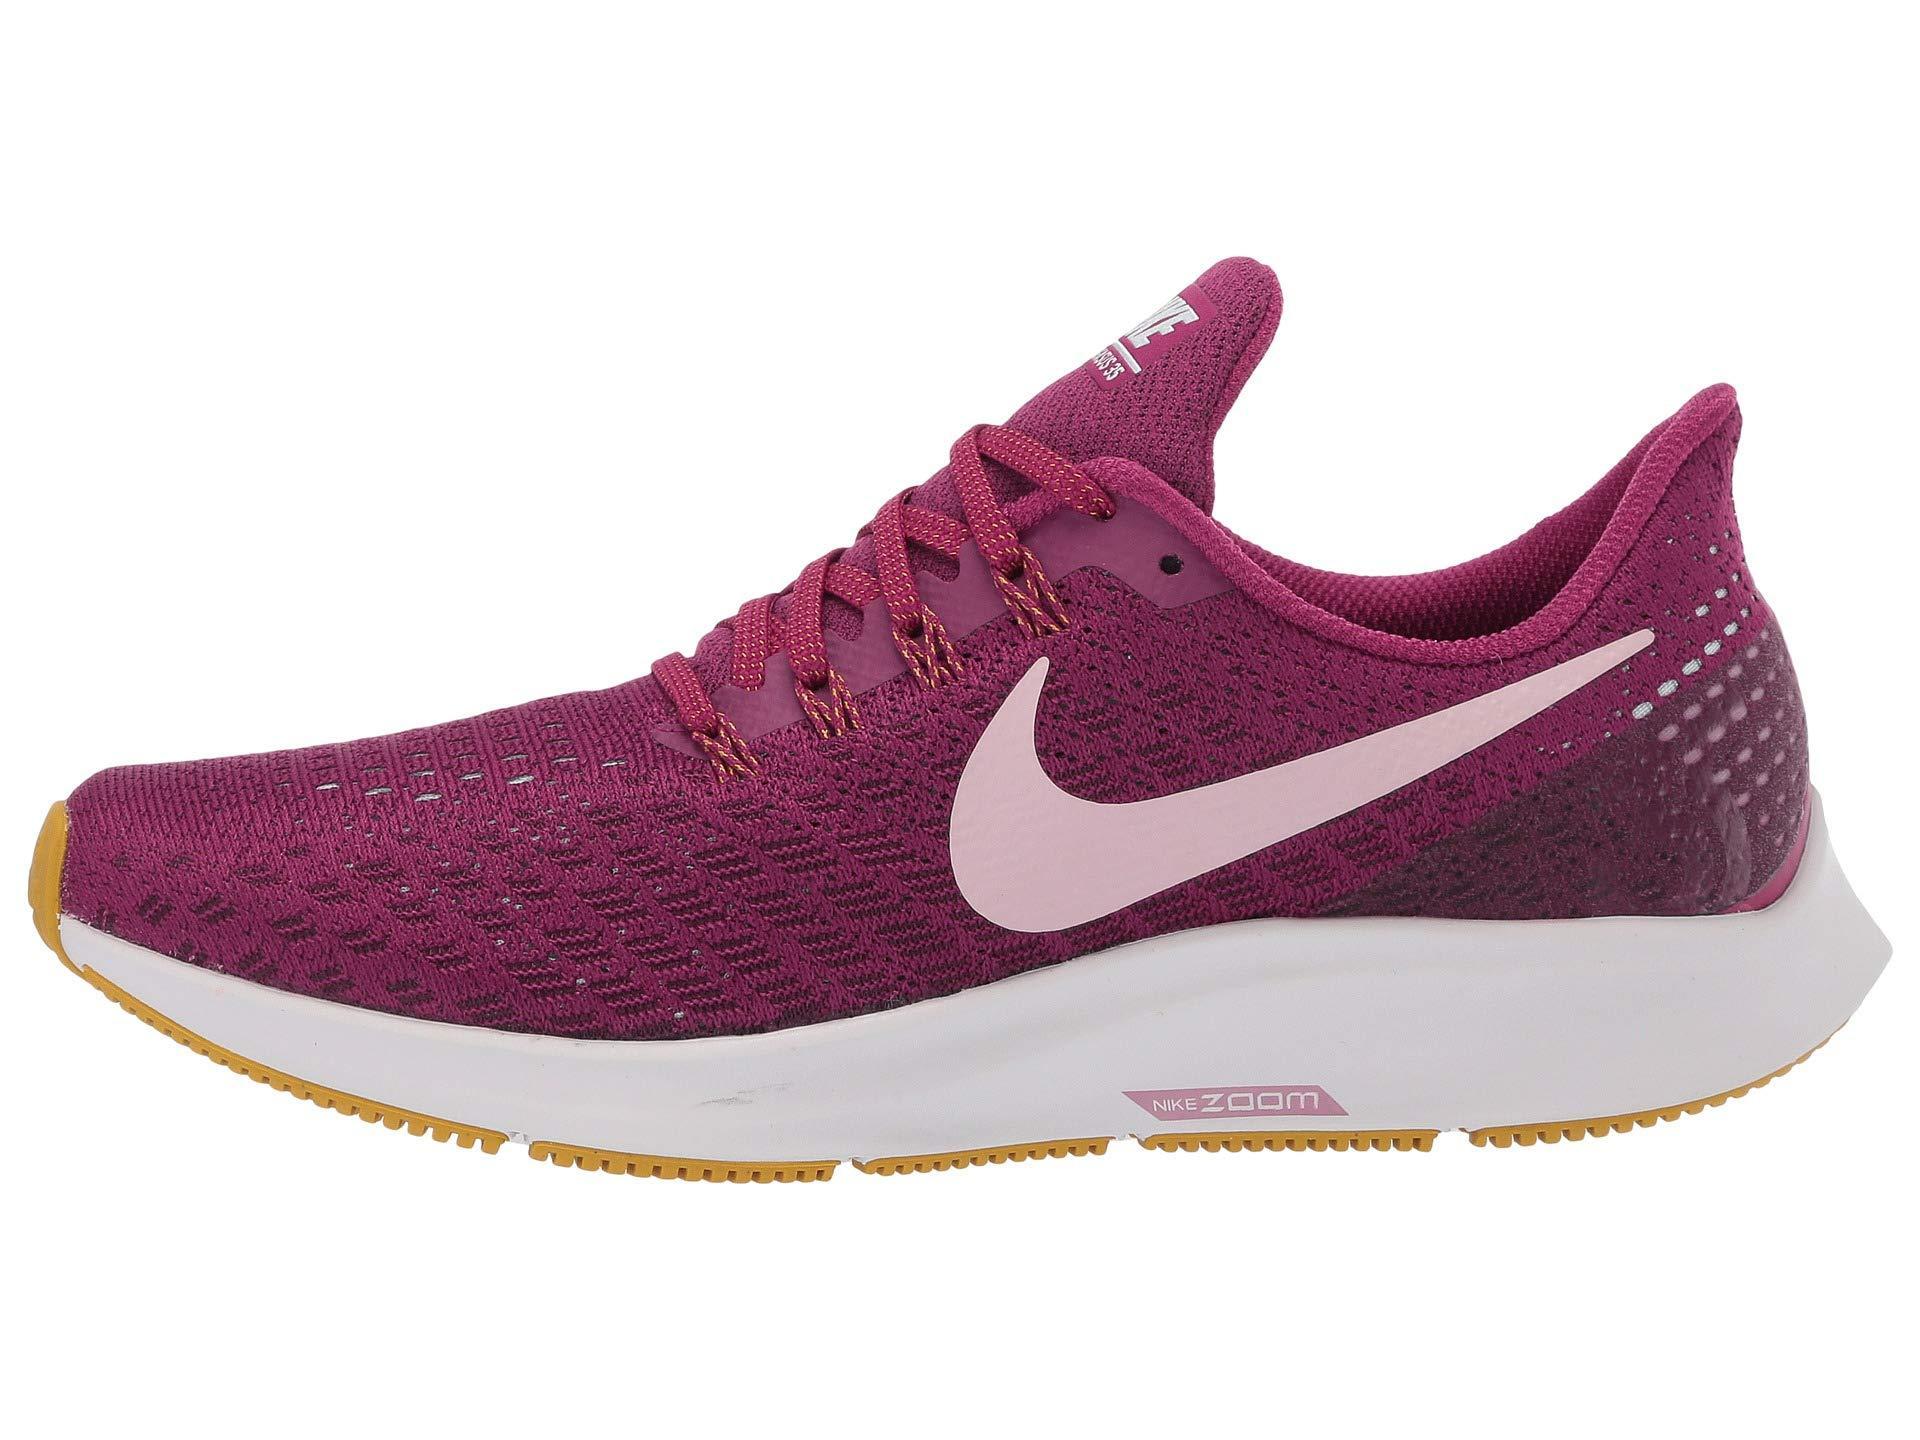 e77423331e032 Lyst - Nike Air Zoom Pegasus 35 (vast Grey black pink Foam lime Blast) Women s  Running Shoes in Purple - Save 30%